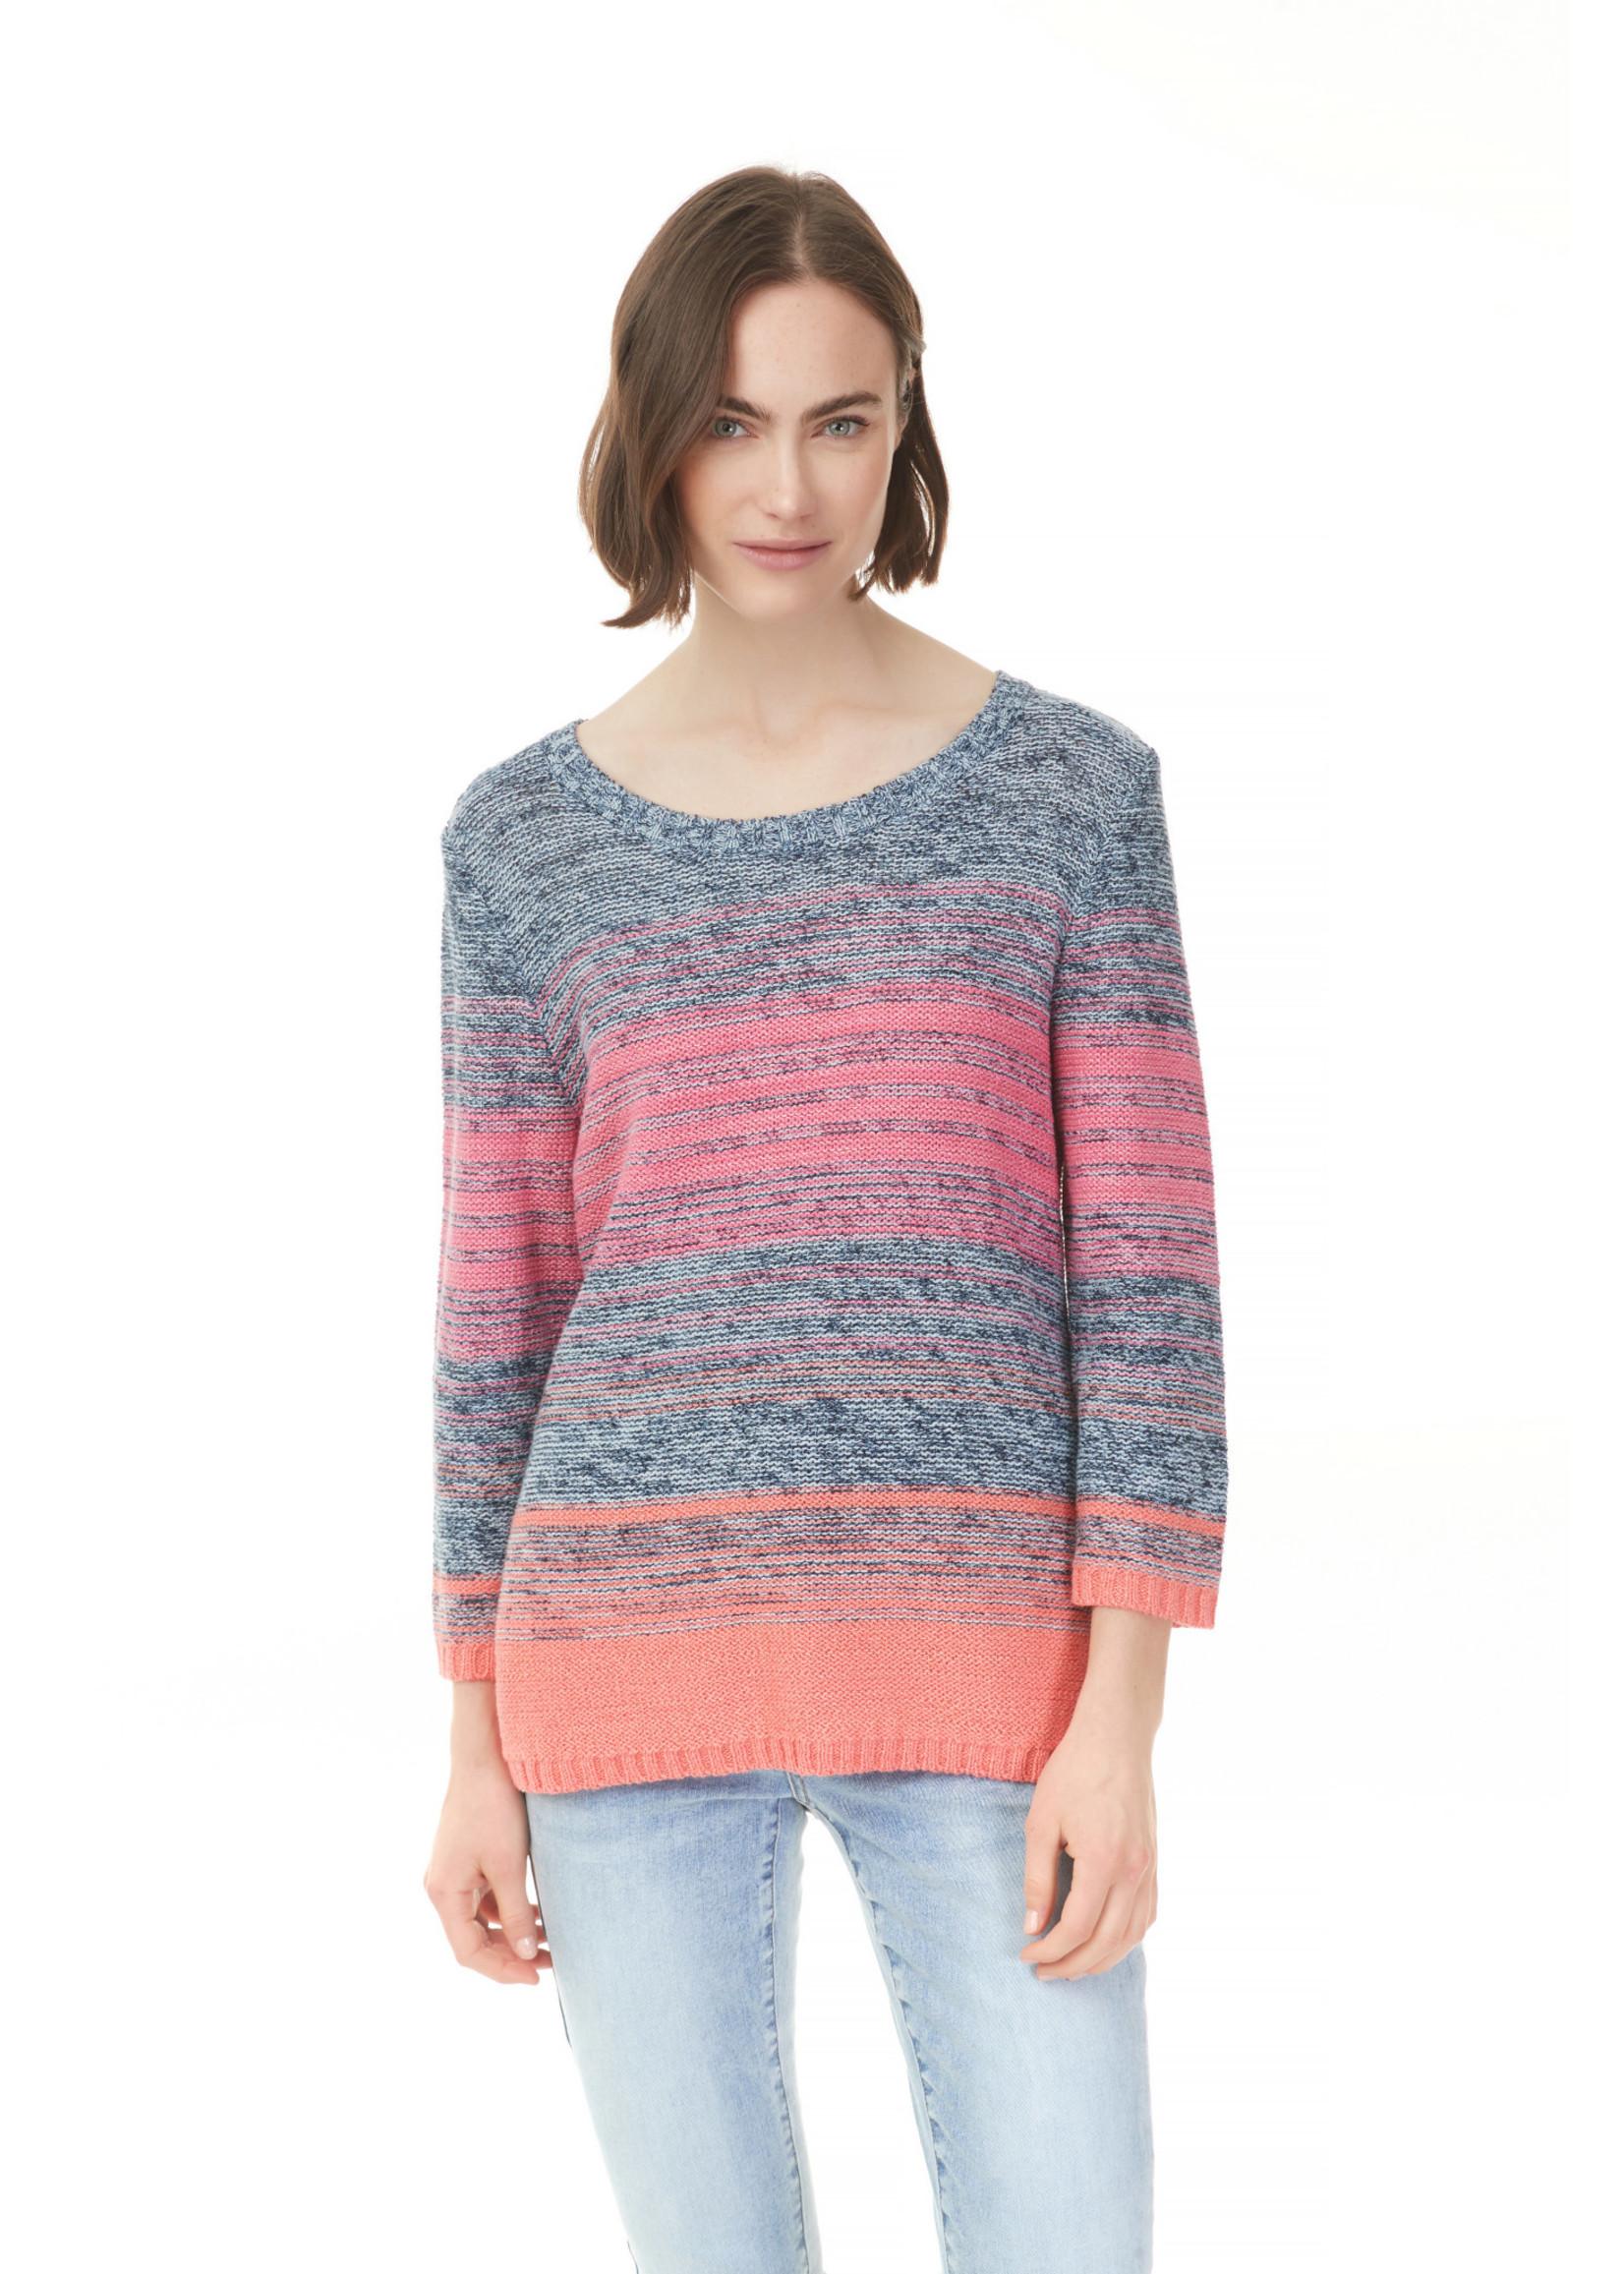 Charlie B Space Dye Yarn Sweater